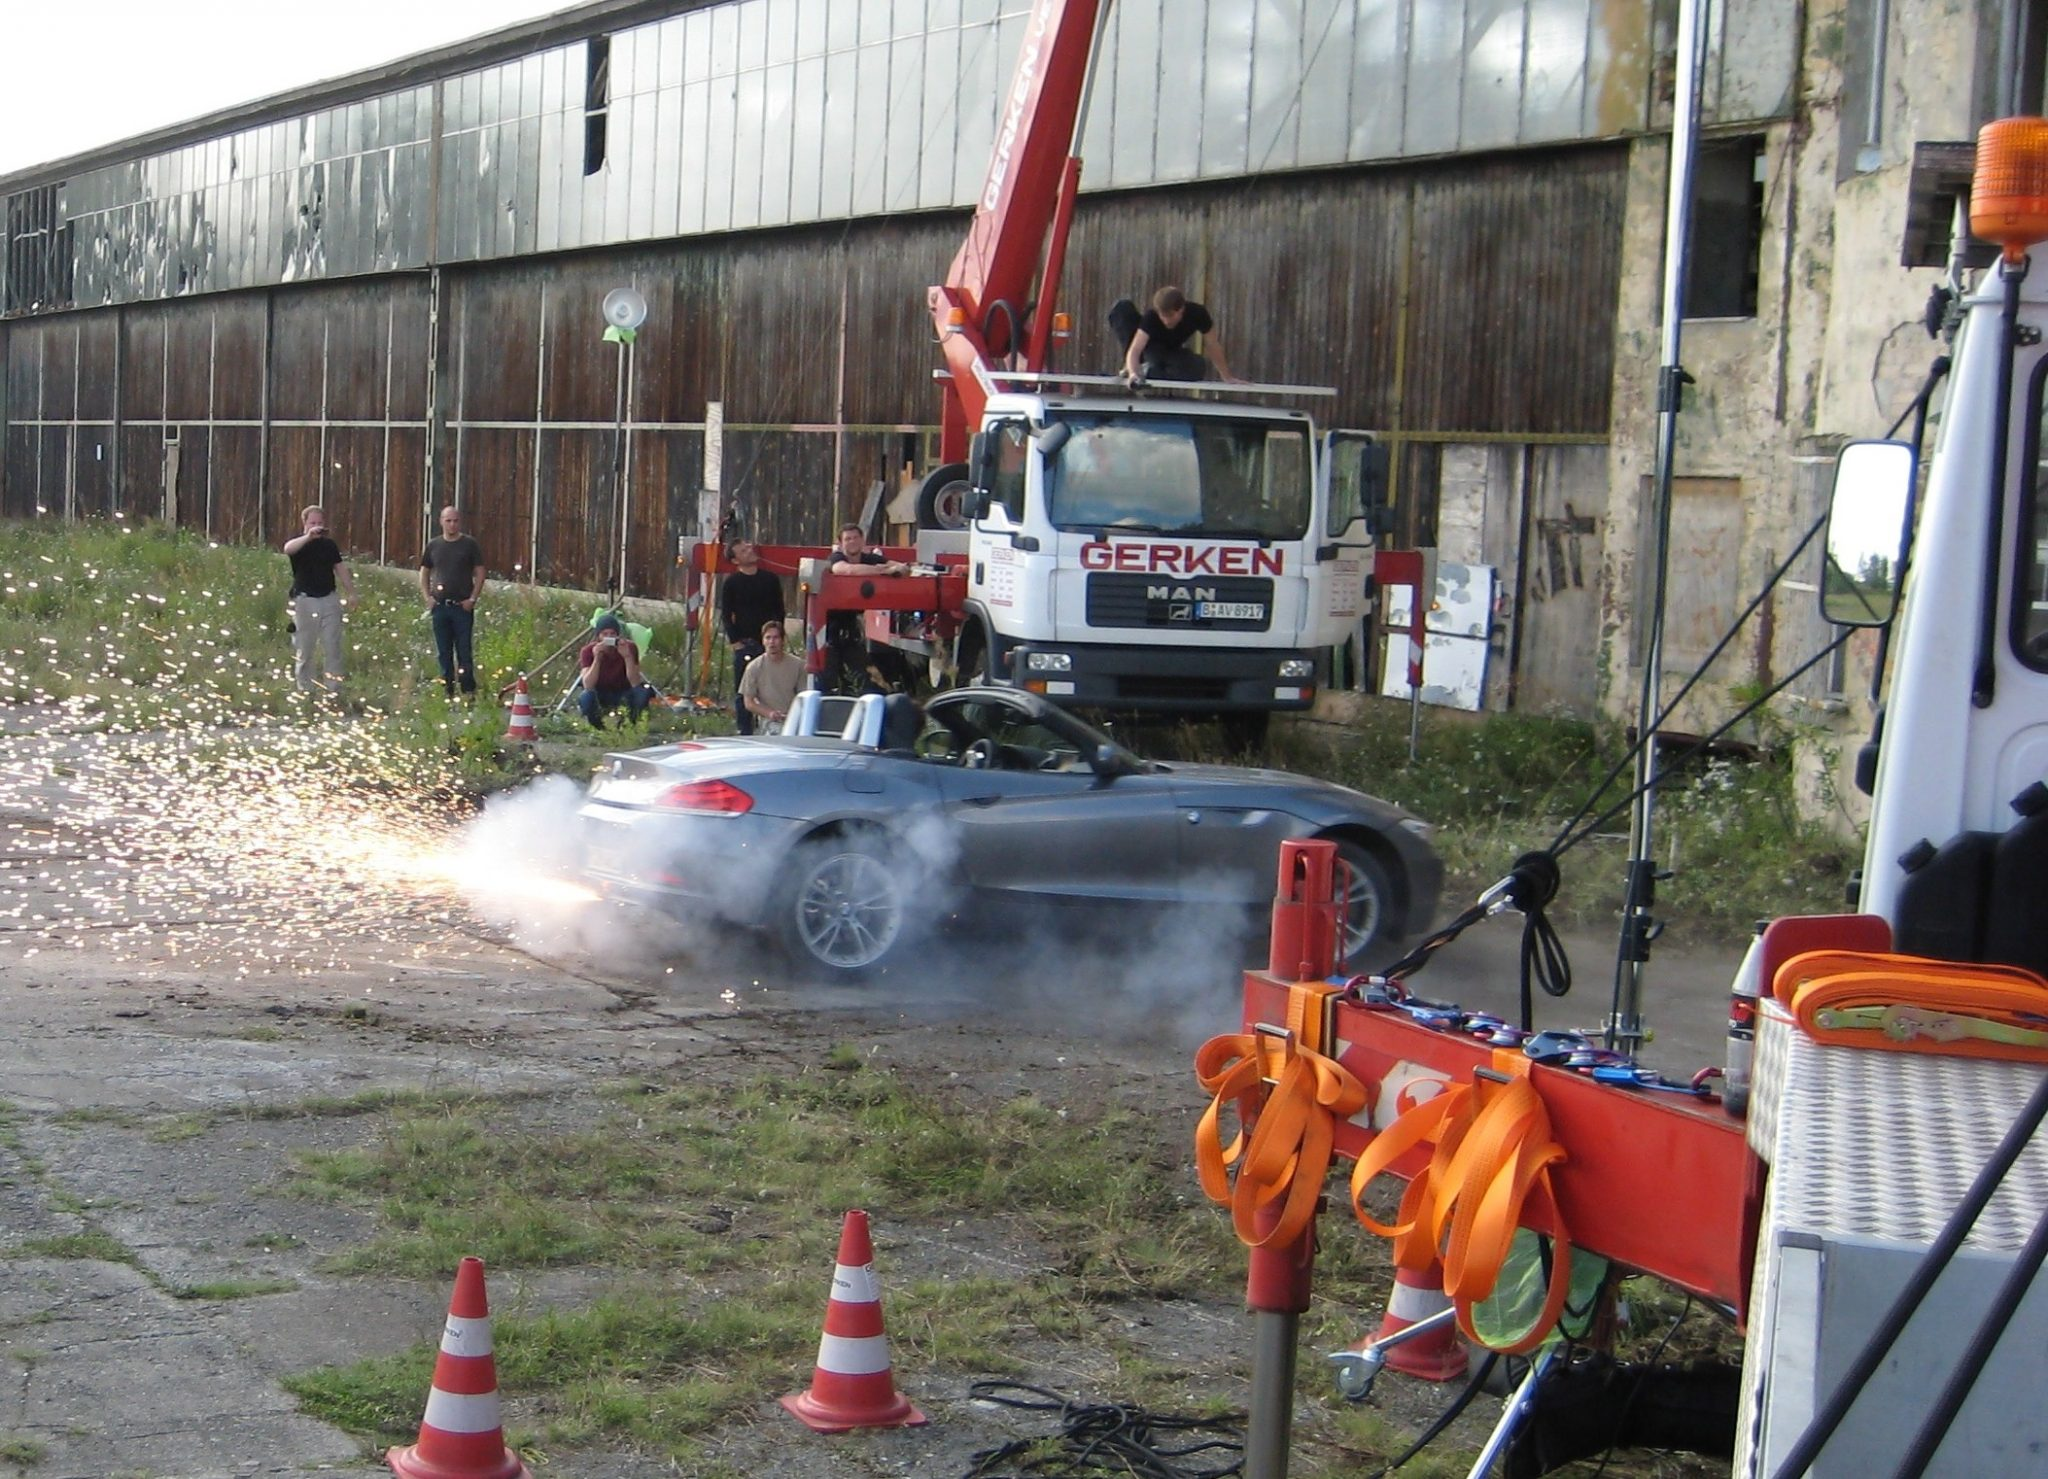 Martin Goeres, Stuntdriving, drifting, j-turn